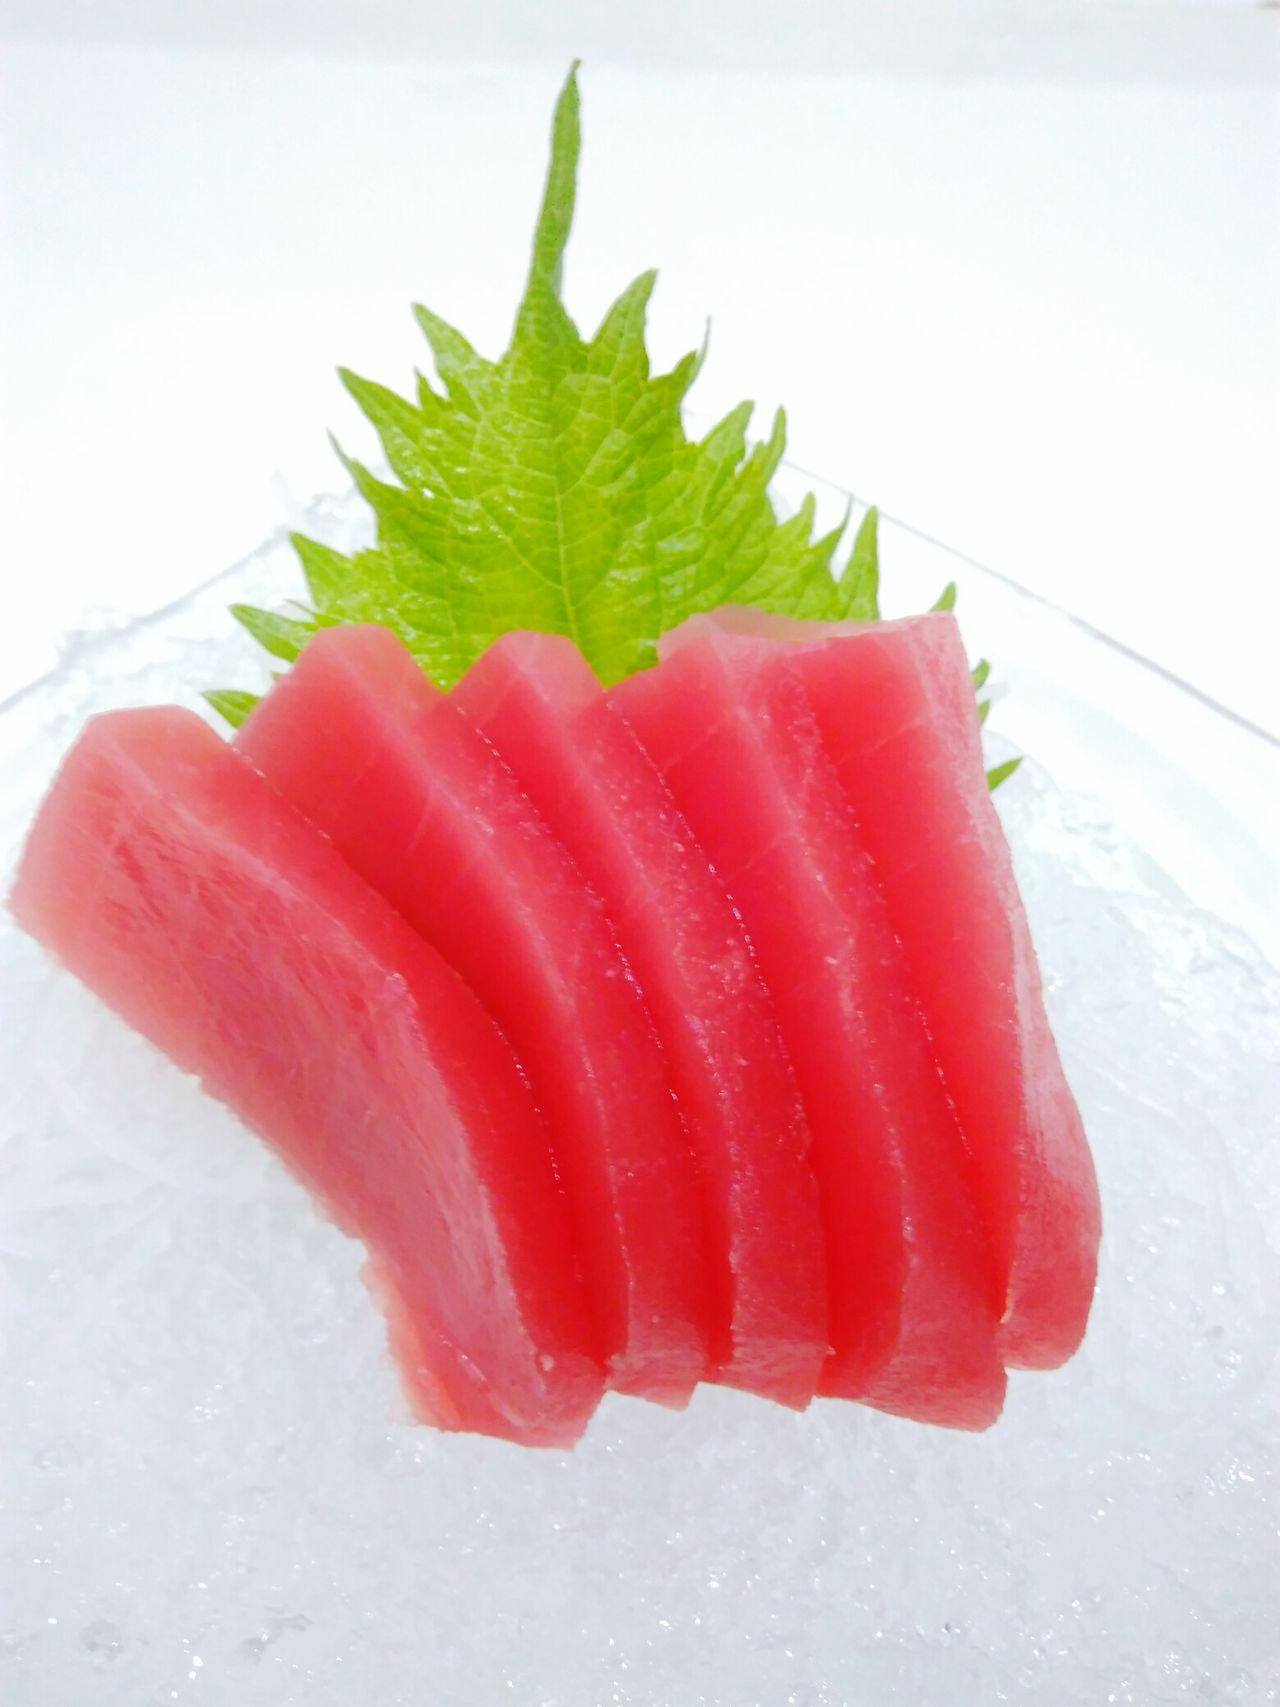 Makuro Sashimi Red Food Freshness Food And Drink Sashimi Dinner Sashimilovers Makuro Fish Healthy Eating Close-up No People Thailand Japanese Cuisine Japanese Style